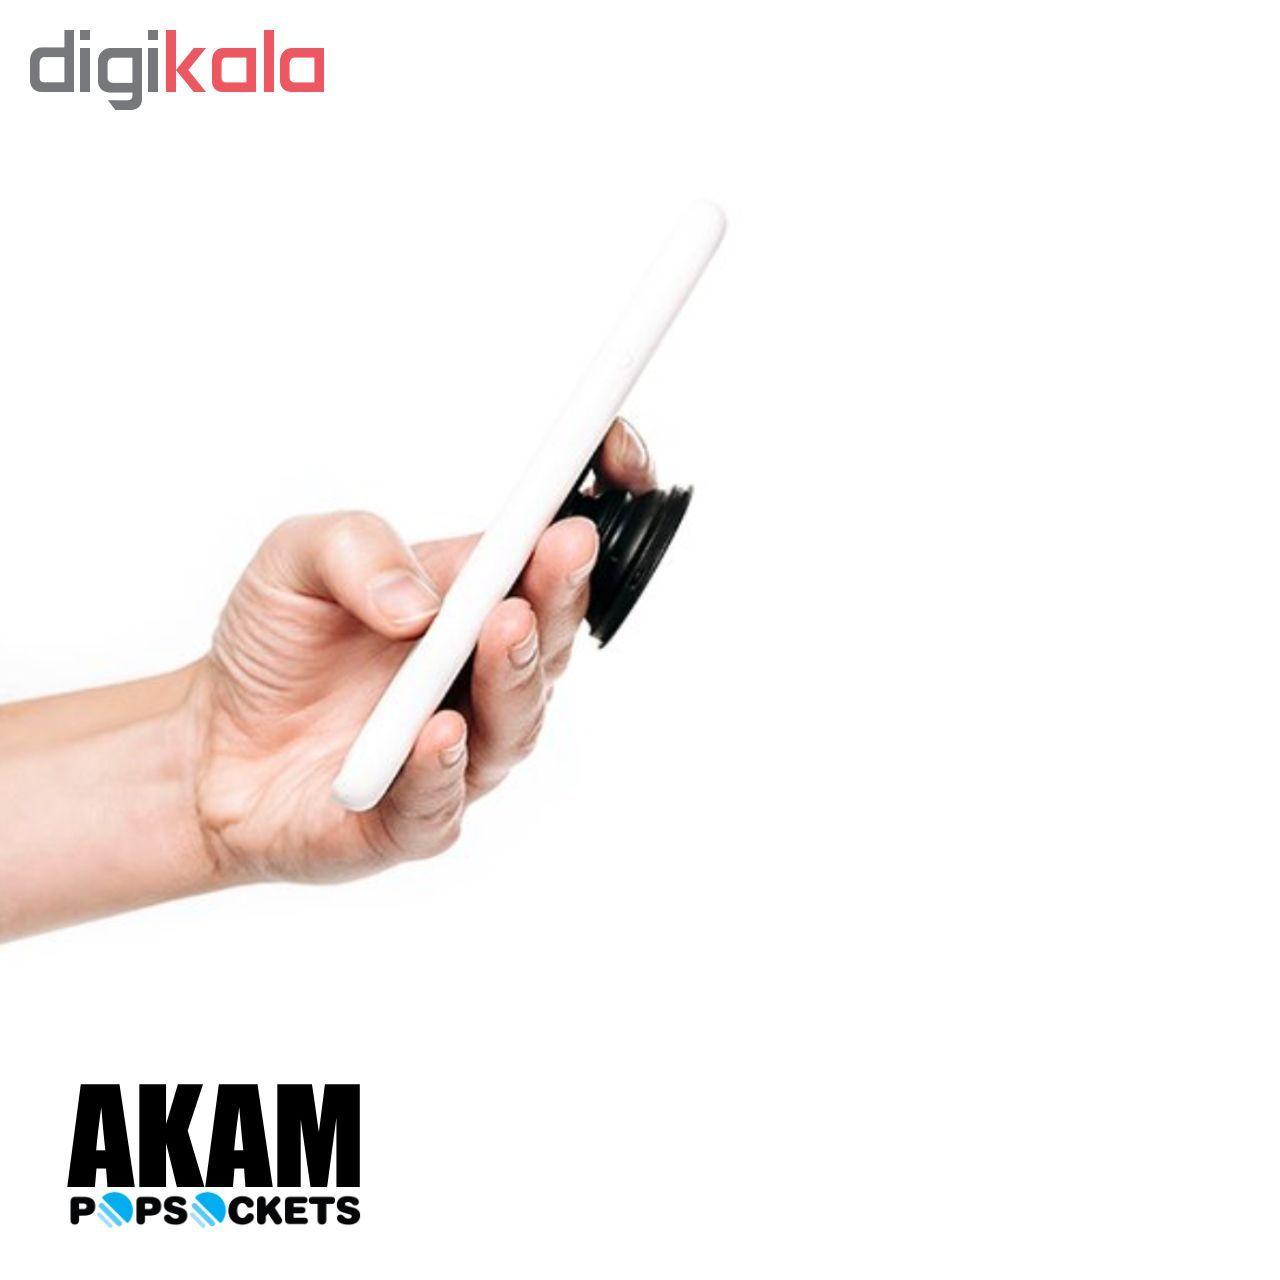 پایه نگهدارنده گوشی موبایل پاپ سوکت آکام مدل APS0057 main 1 9